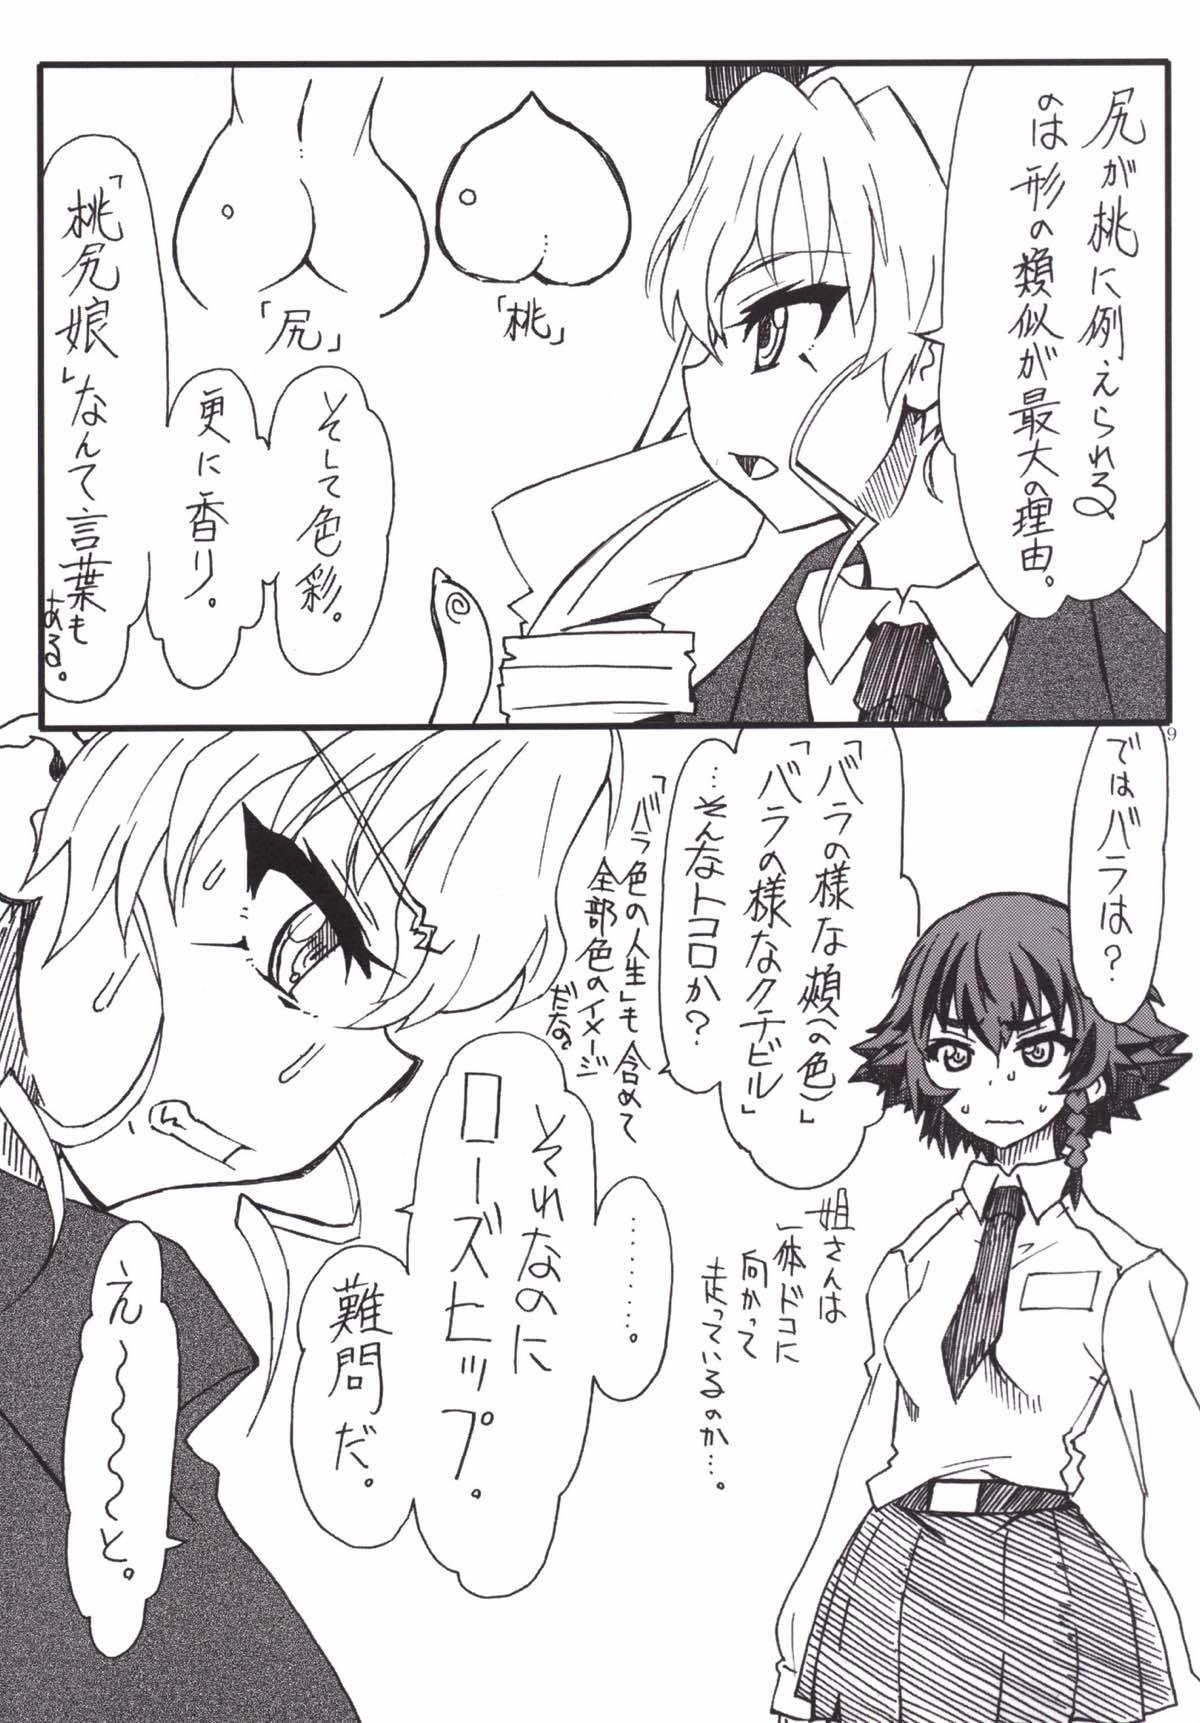 The Chiyomi 7